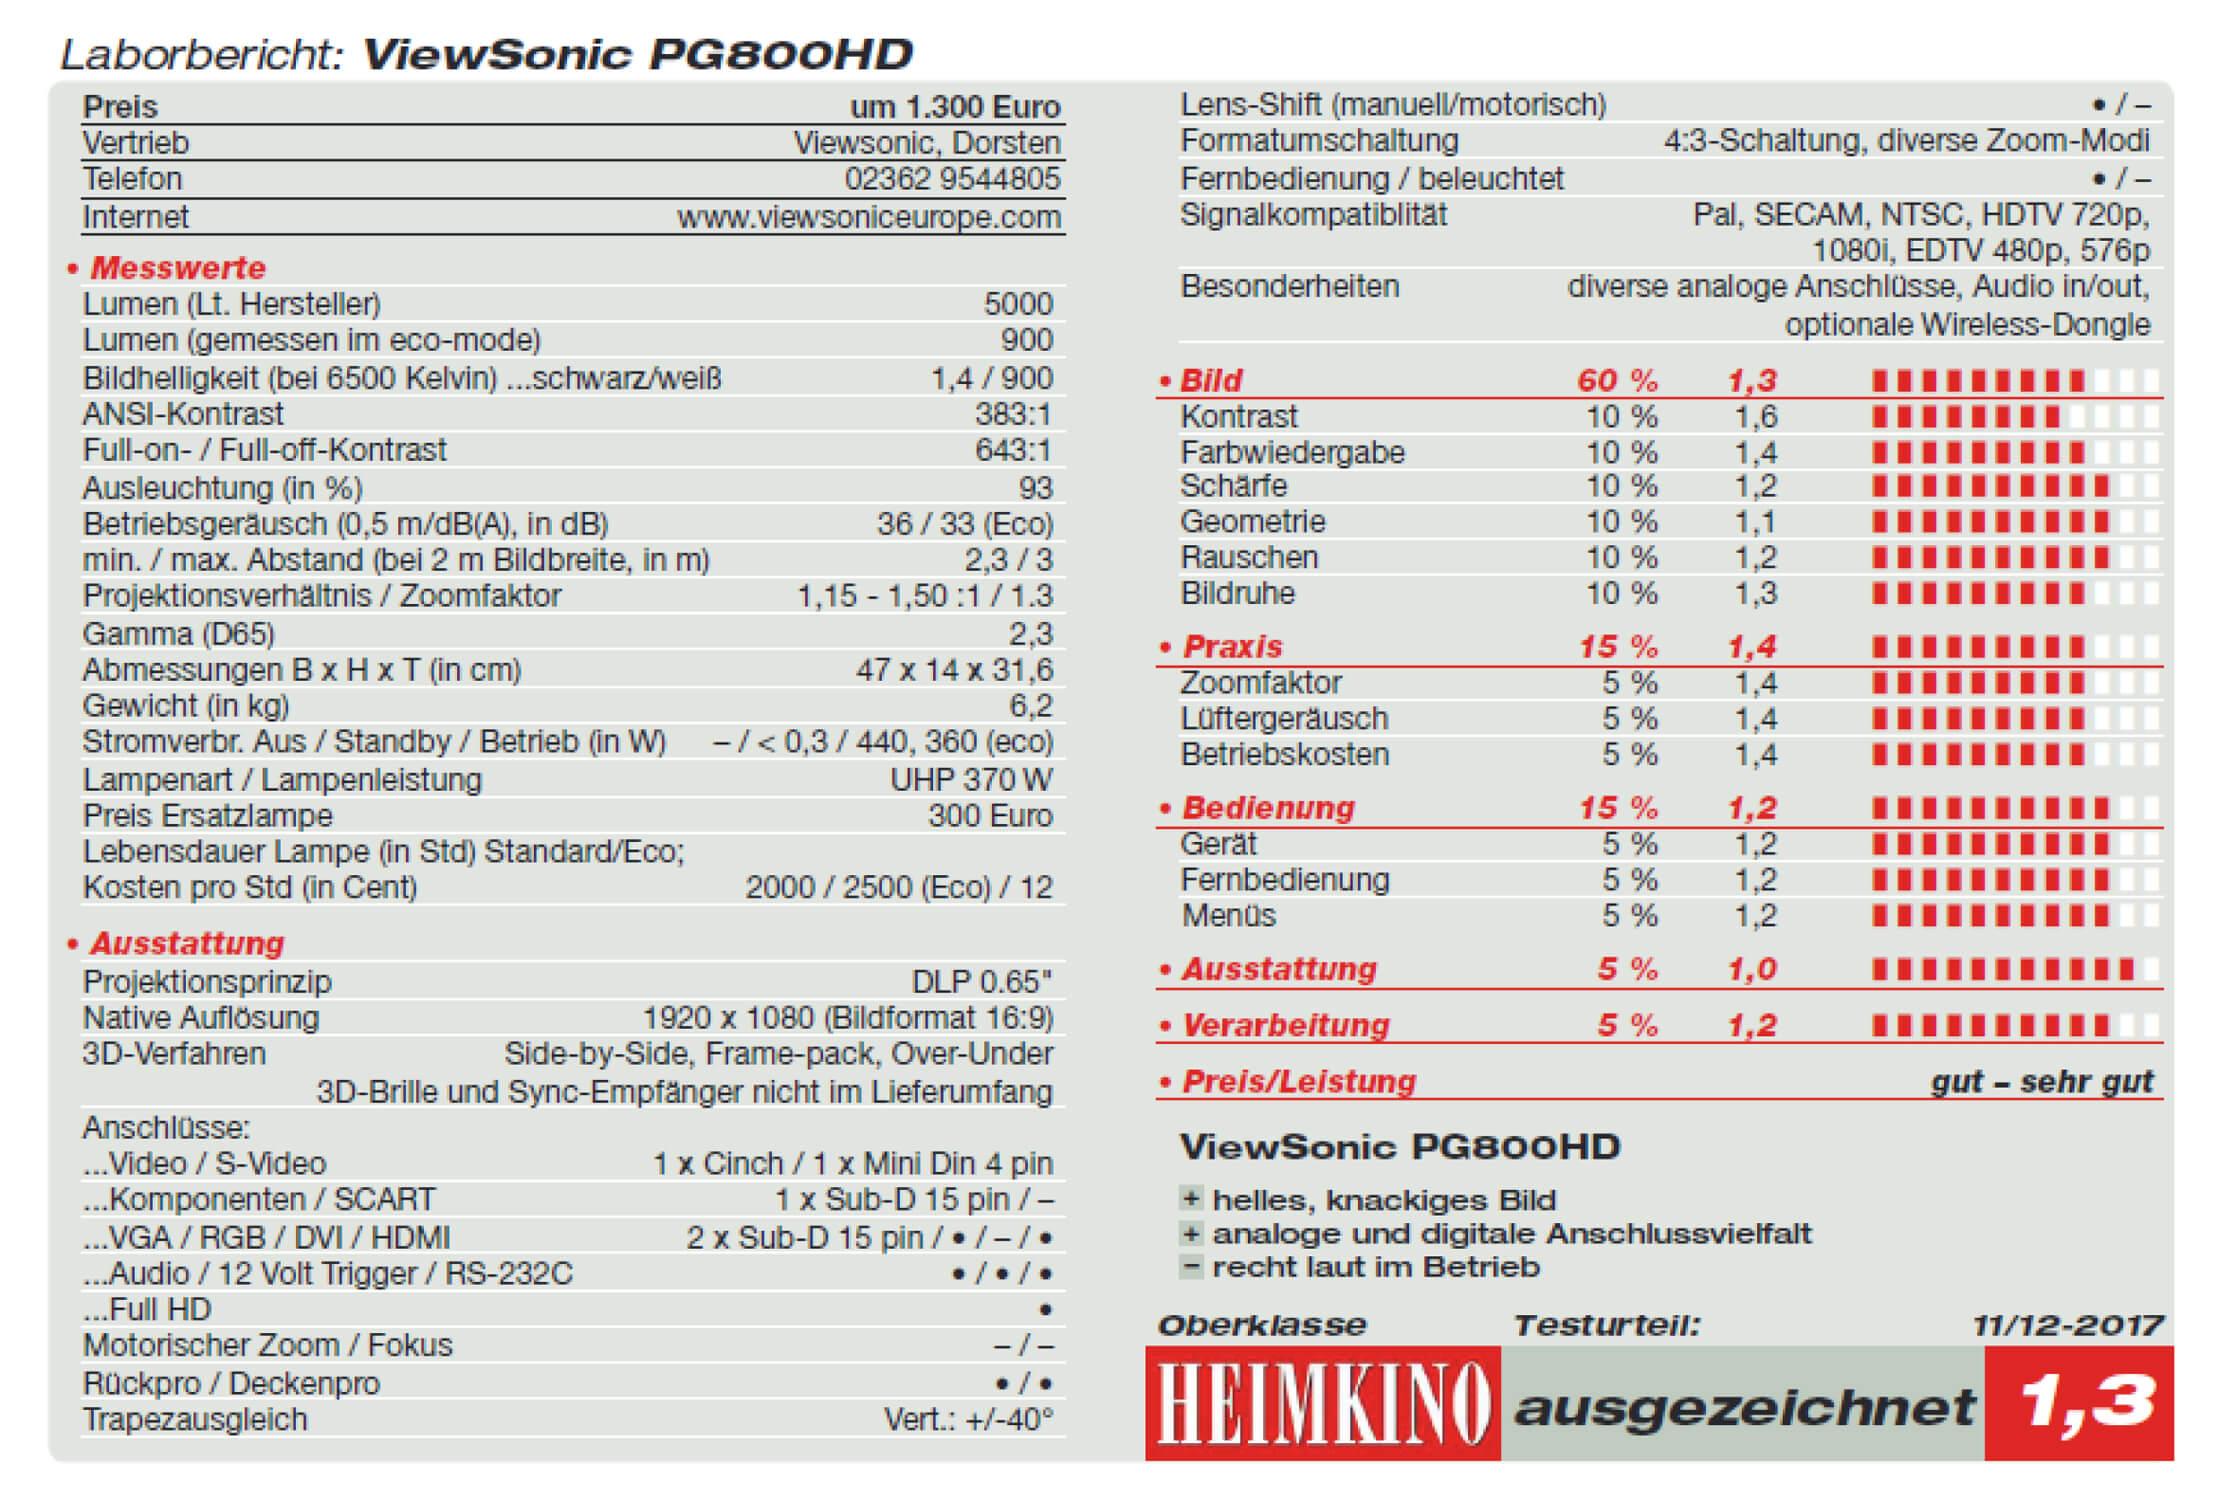 Laborbericht 1,3 Heimkino